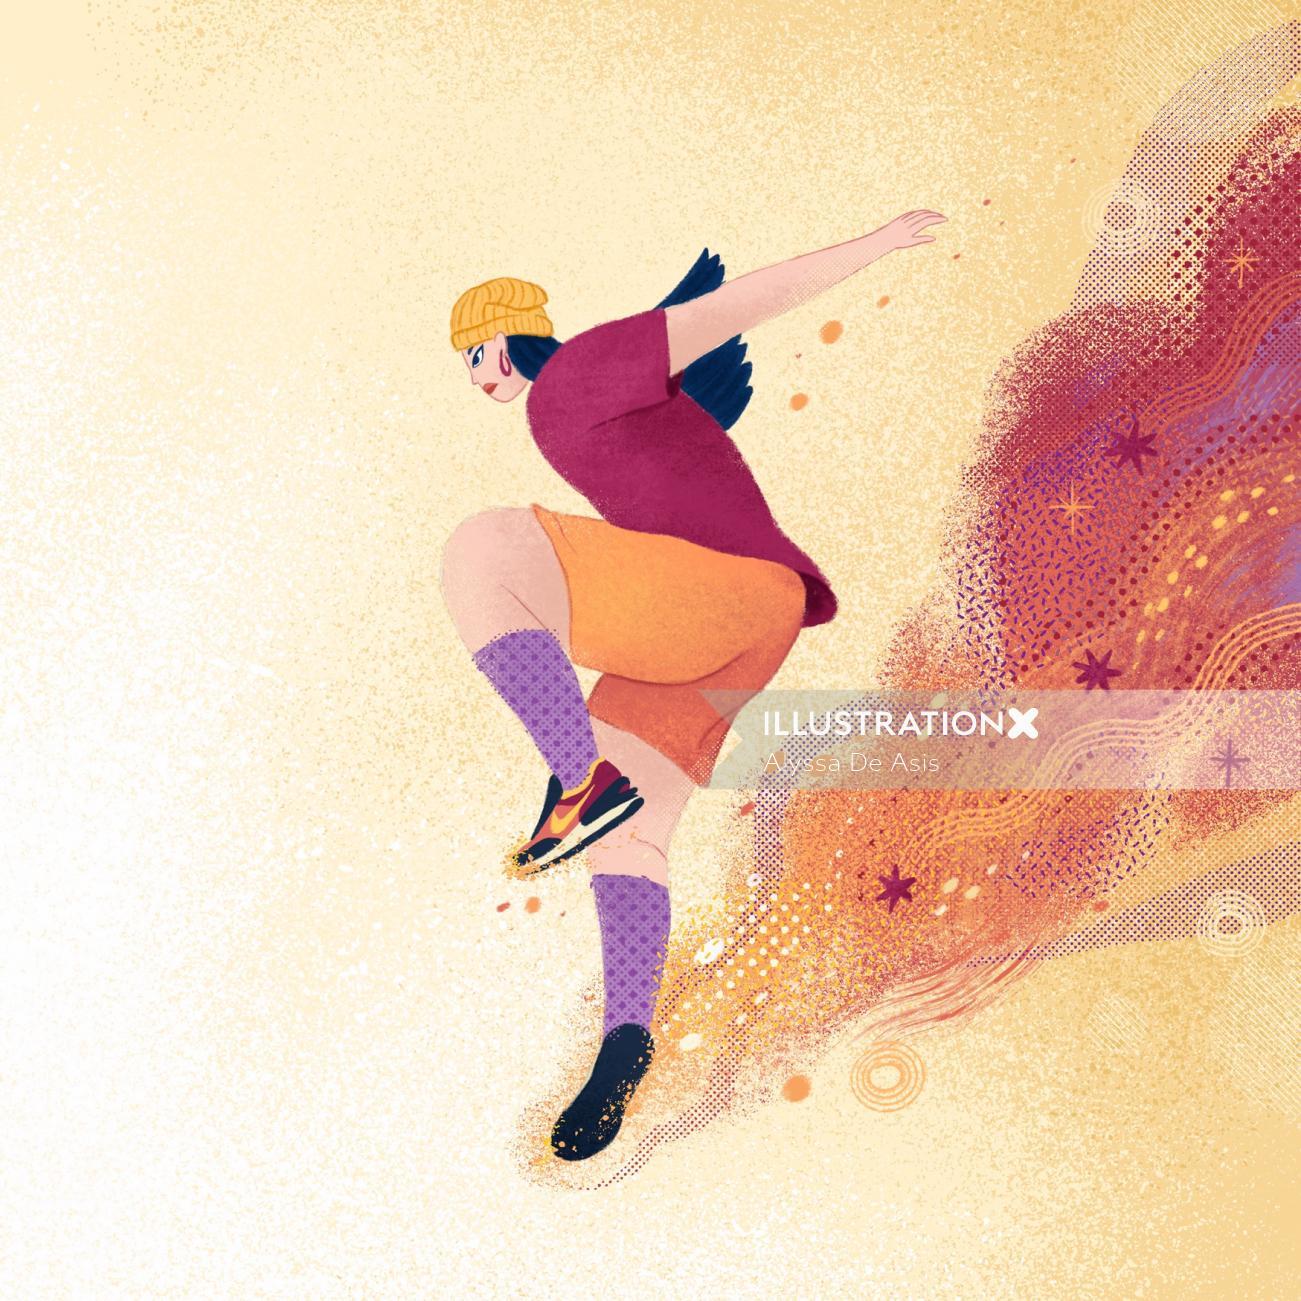 Sports man jumping